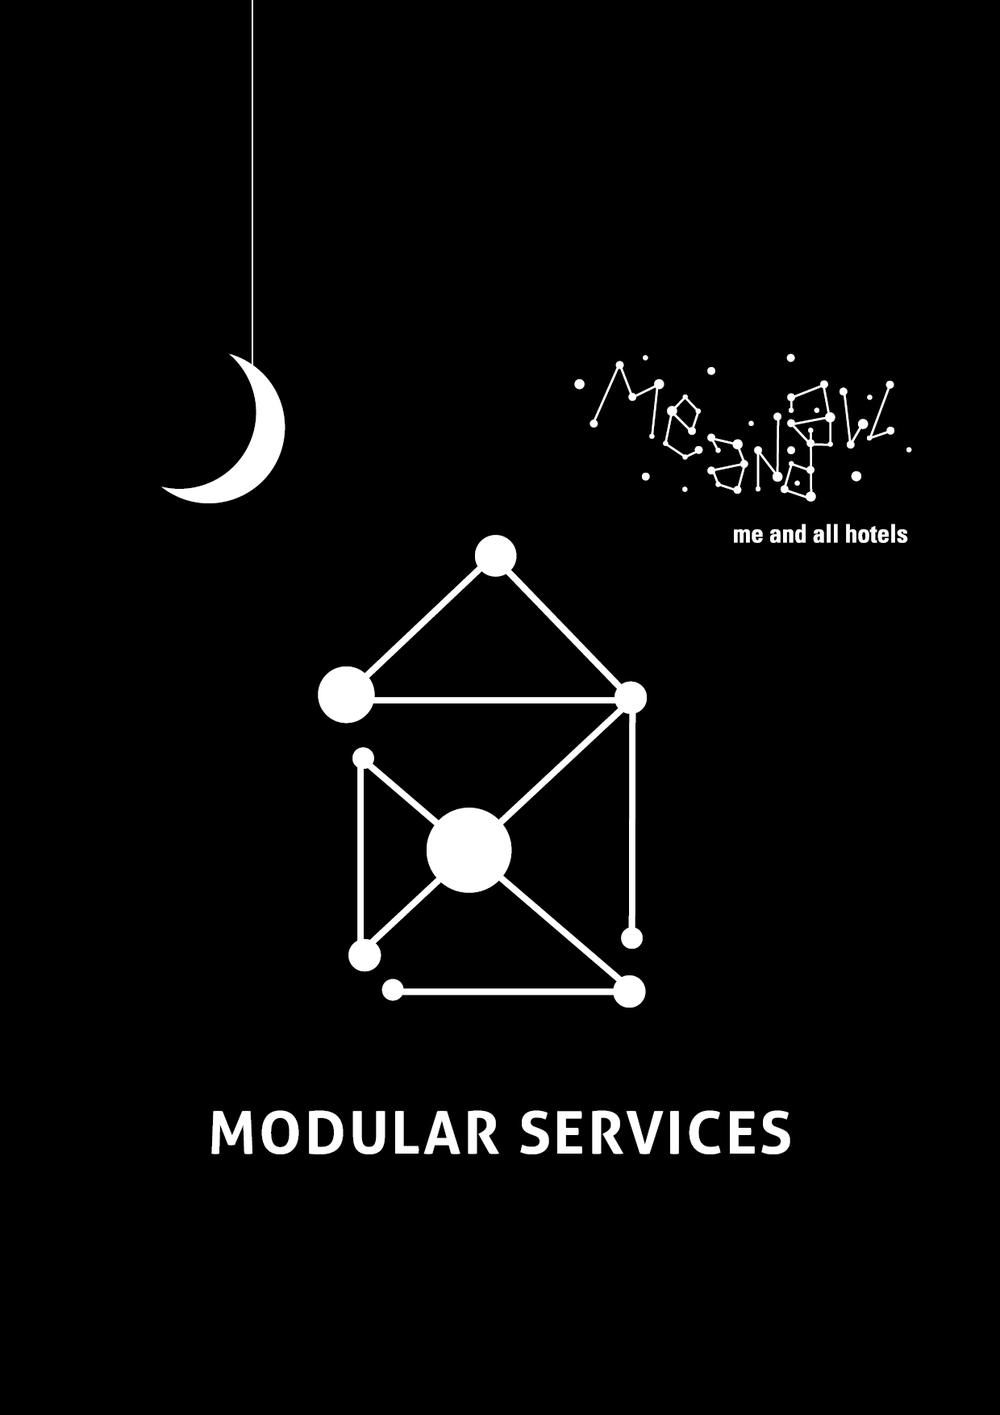 Modularservices bigger